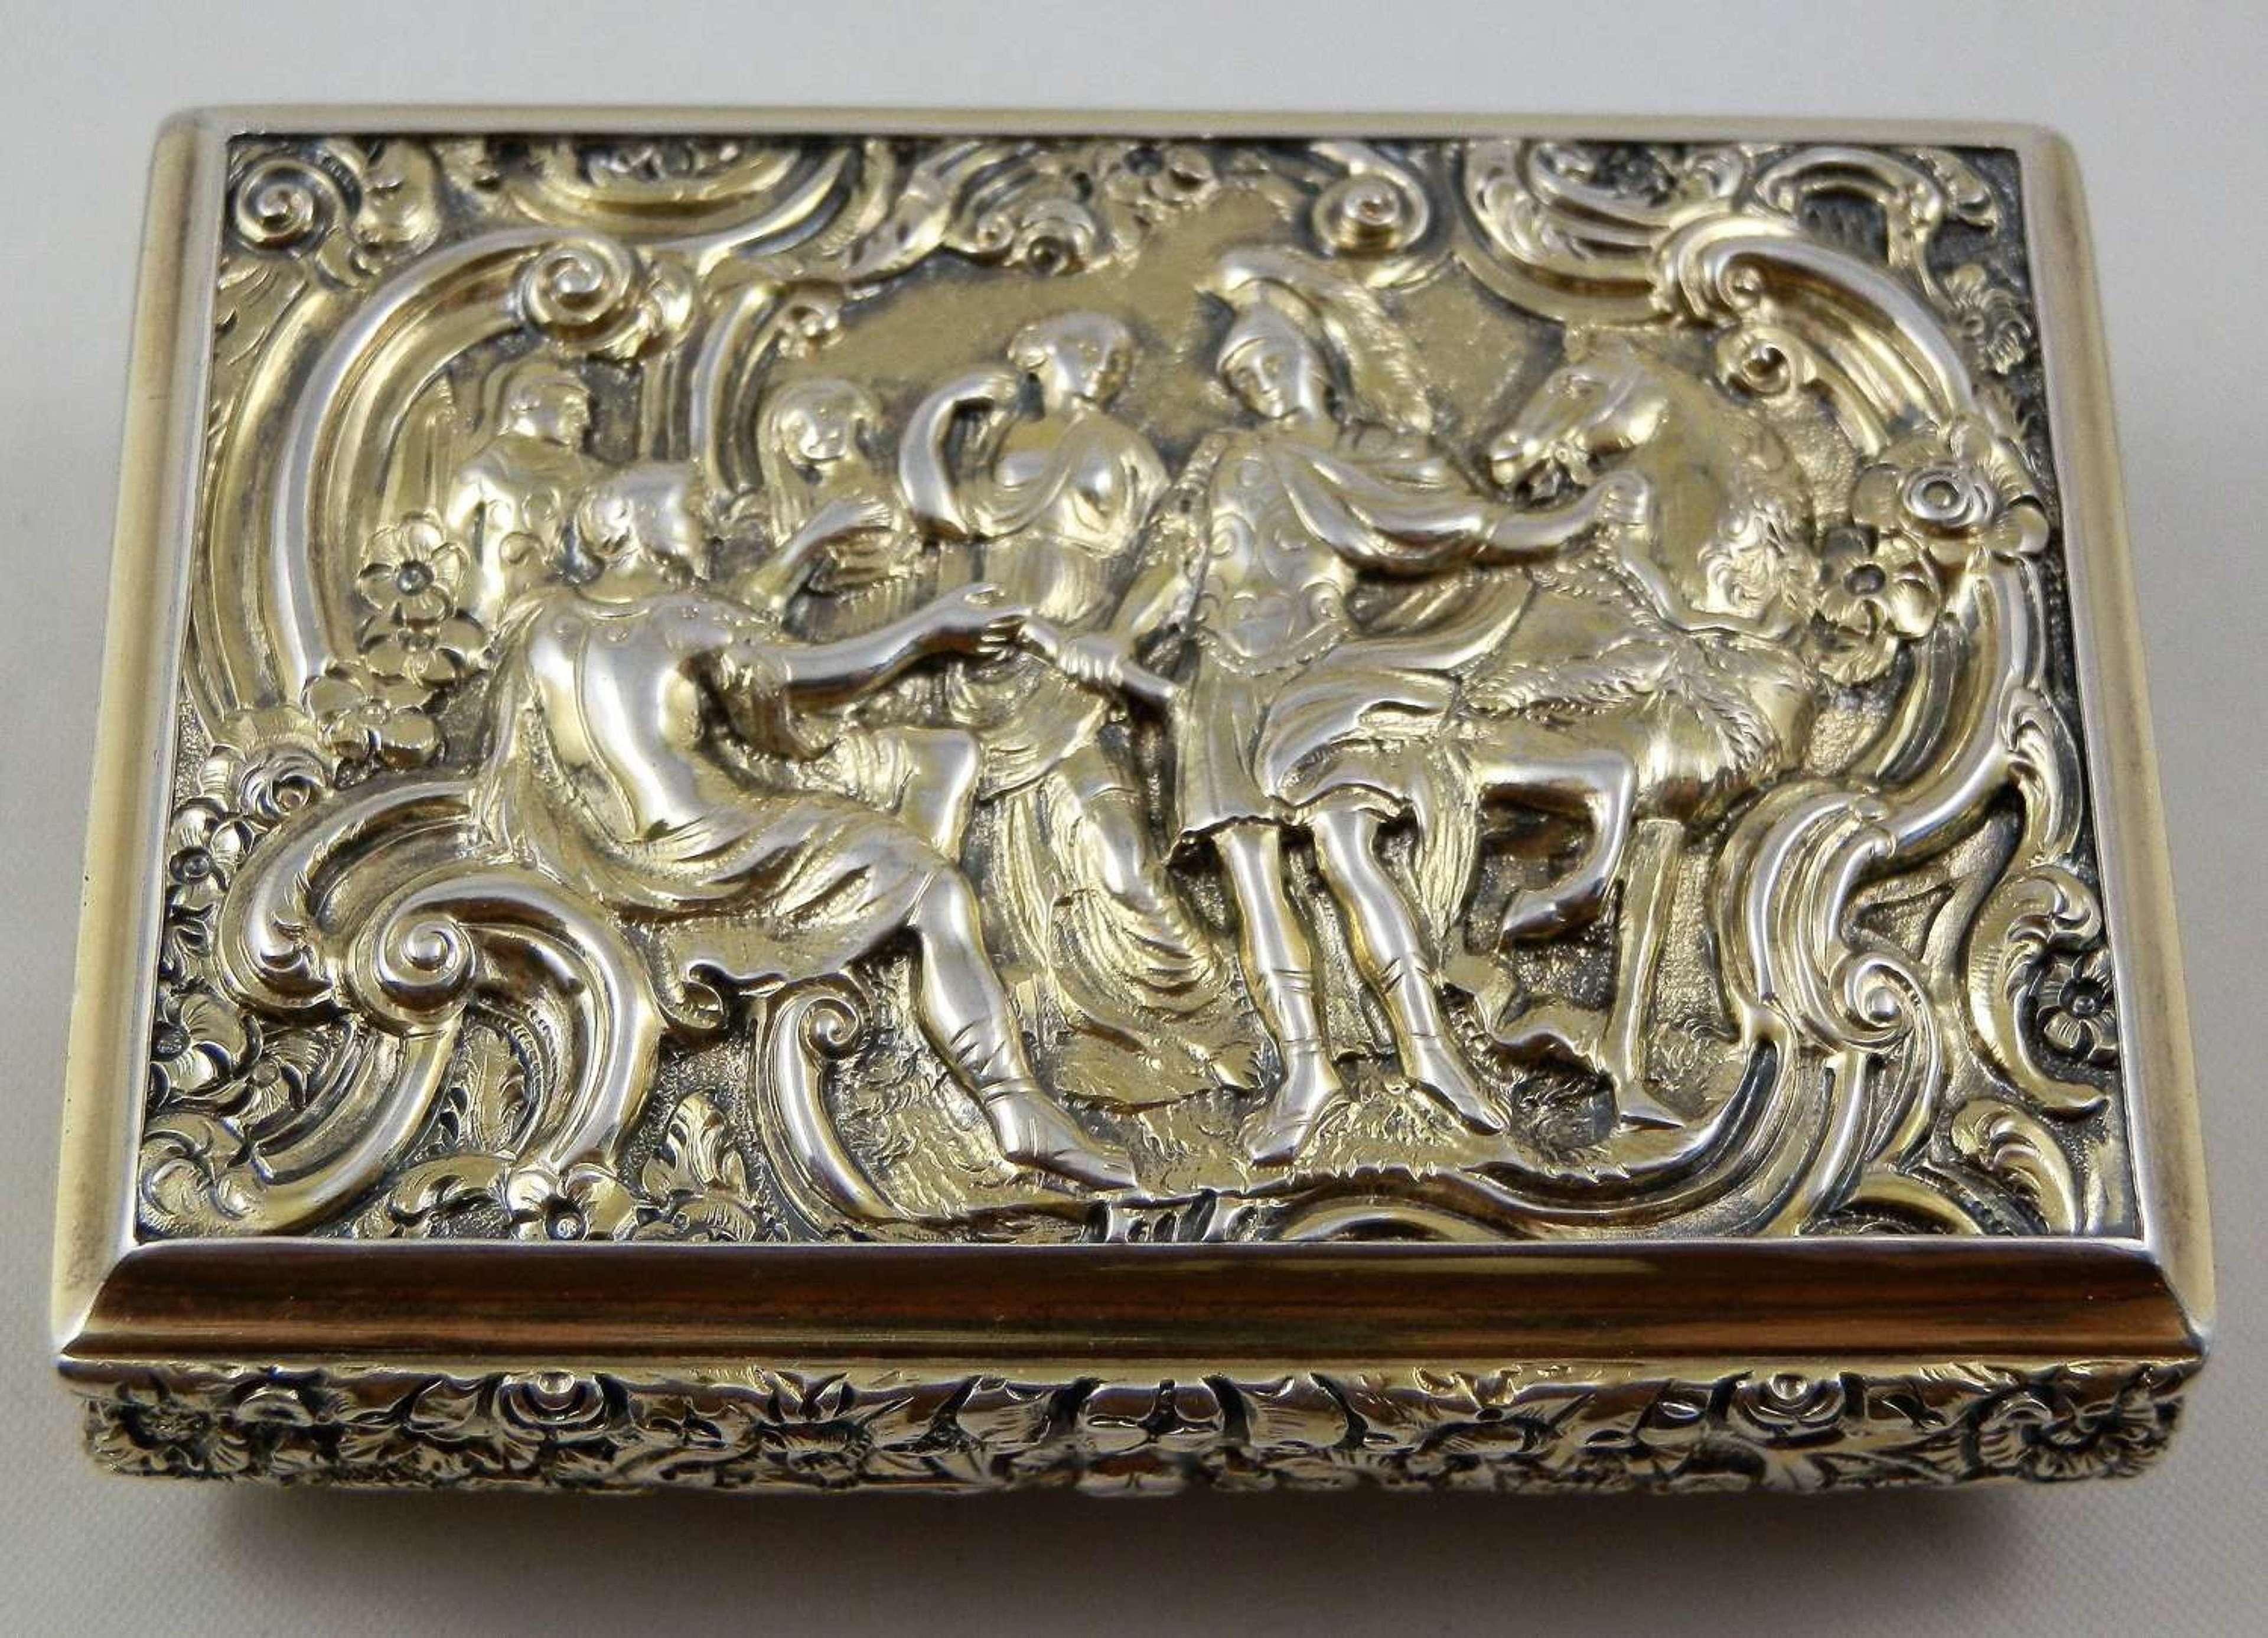 A George IV silver gilt table snuff box, Thomas Shaw, 1827